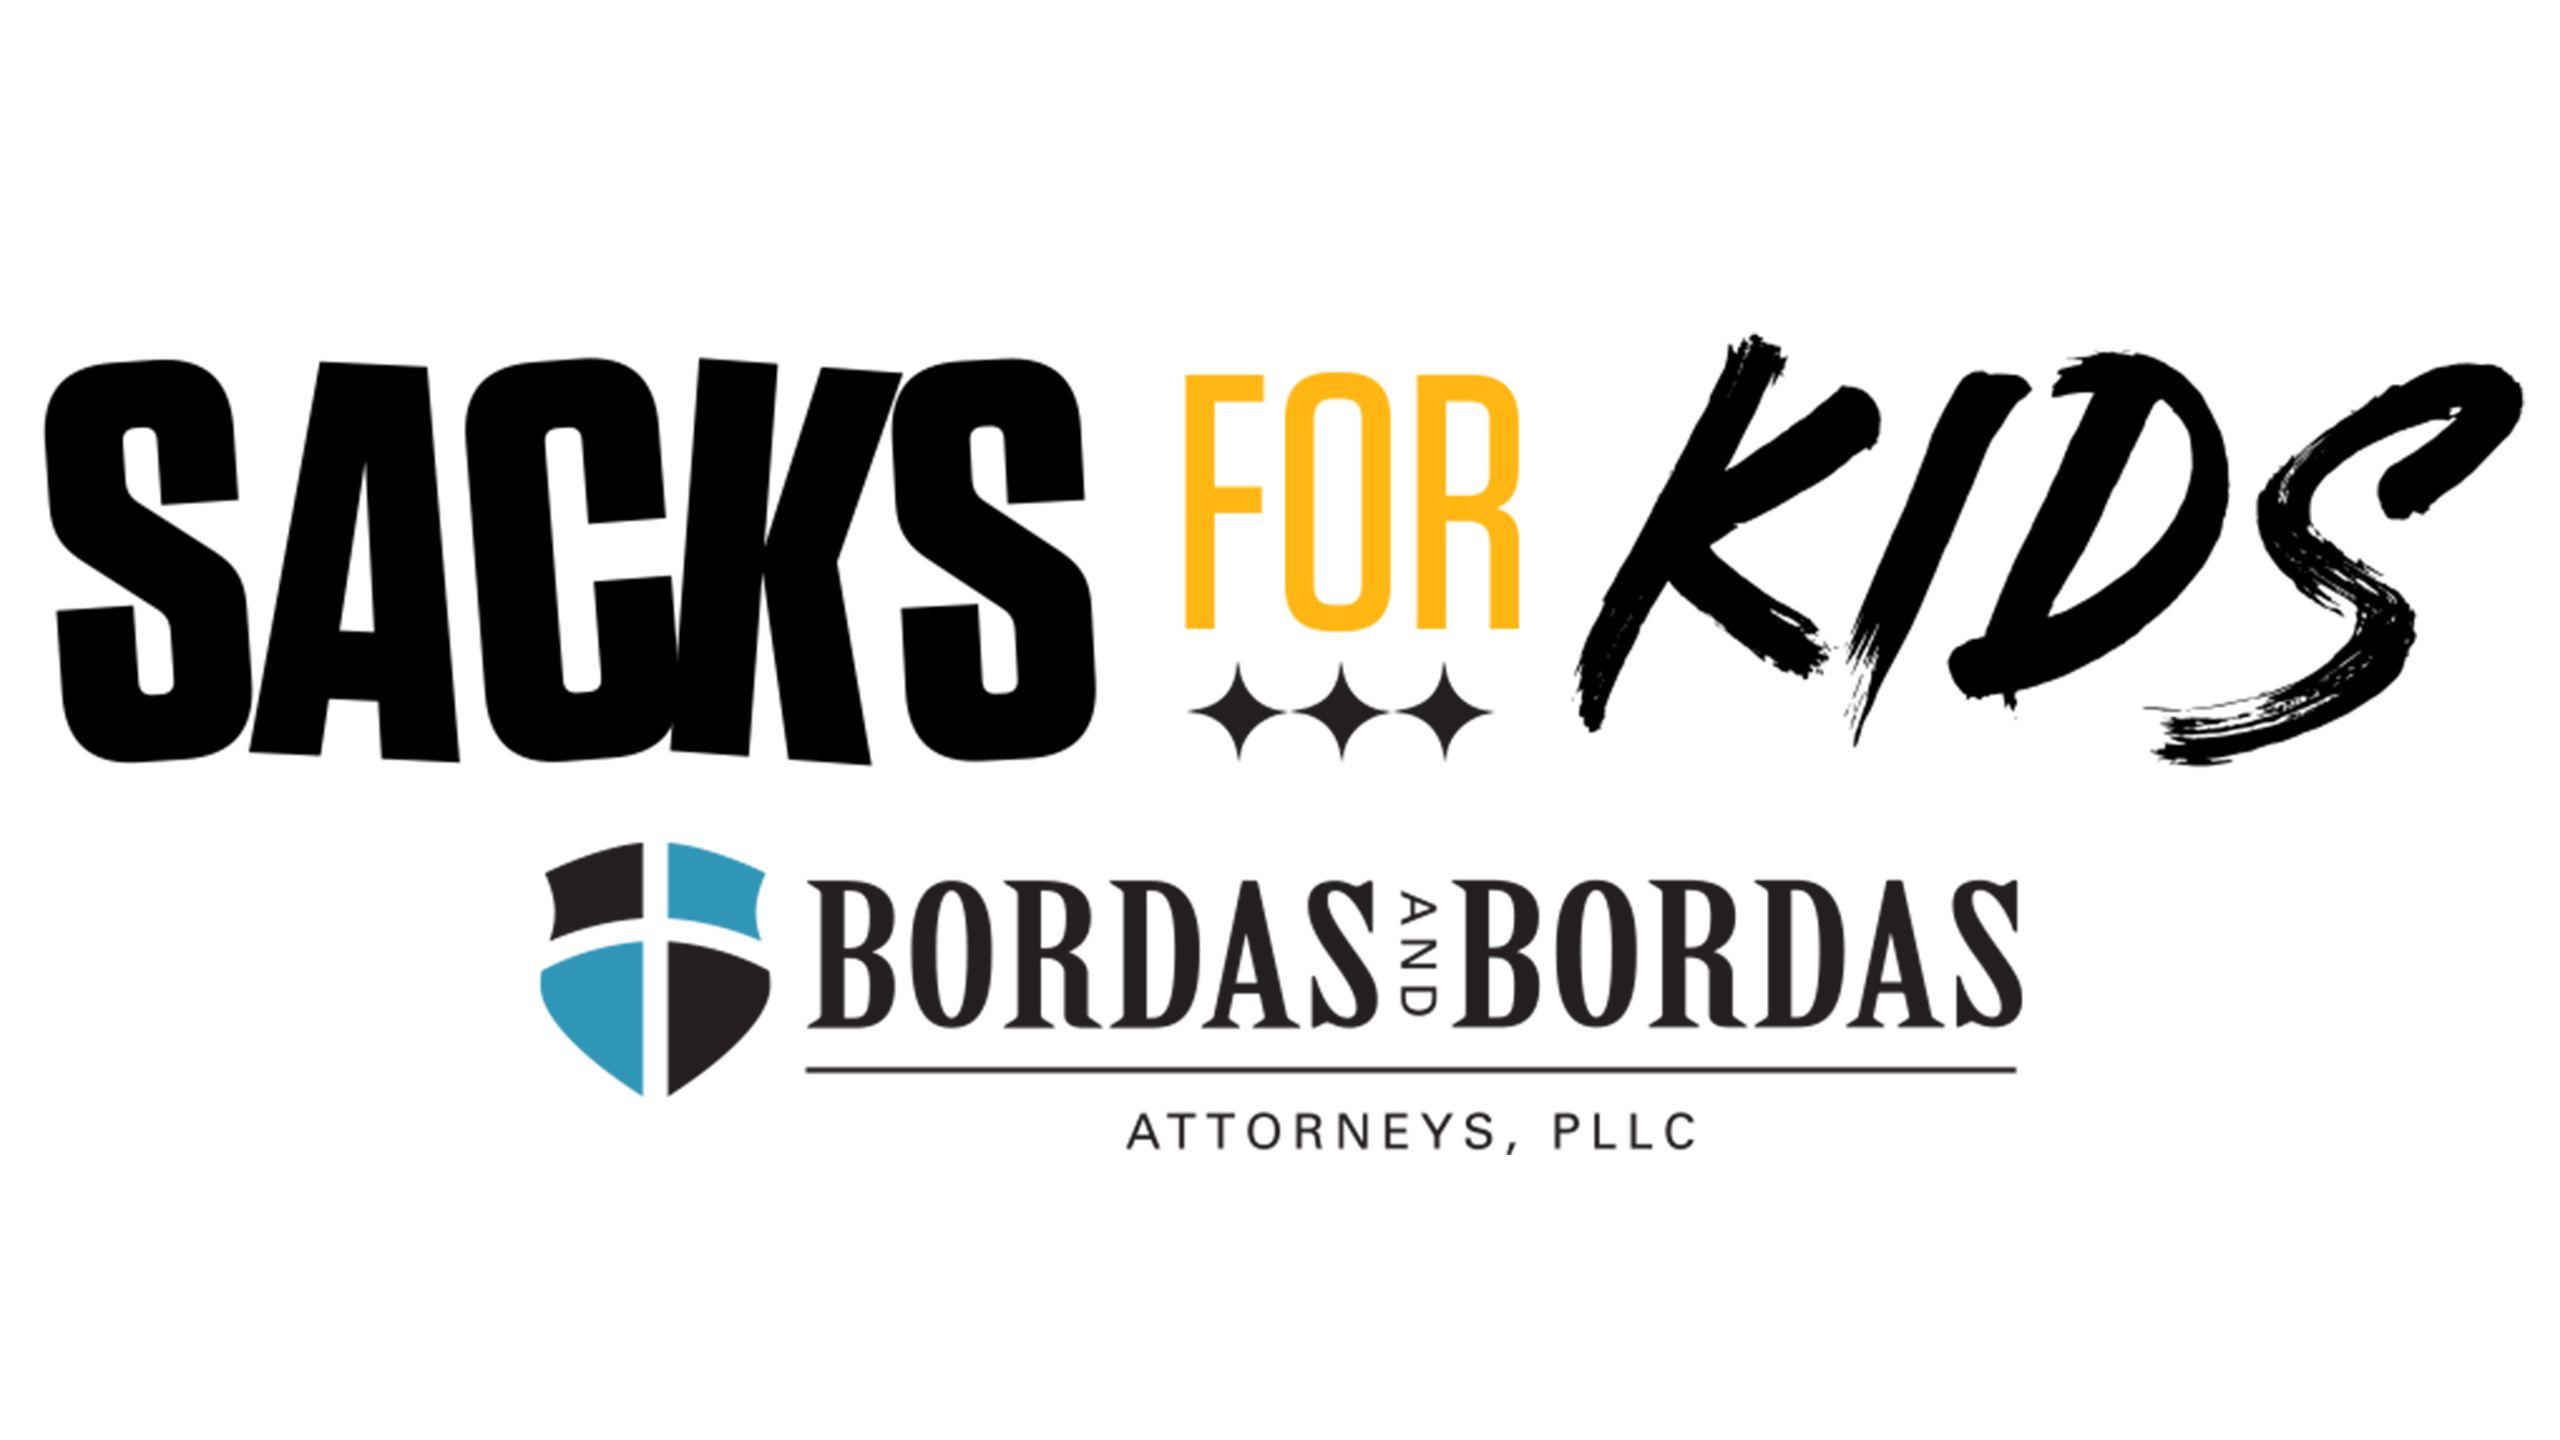 Sacks for Kids, presented by Bordas & Bordas